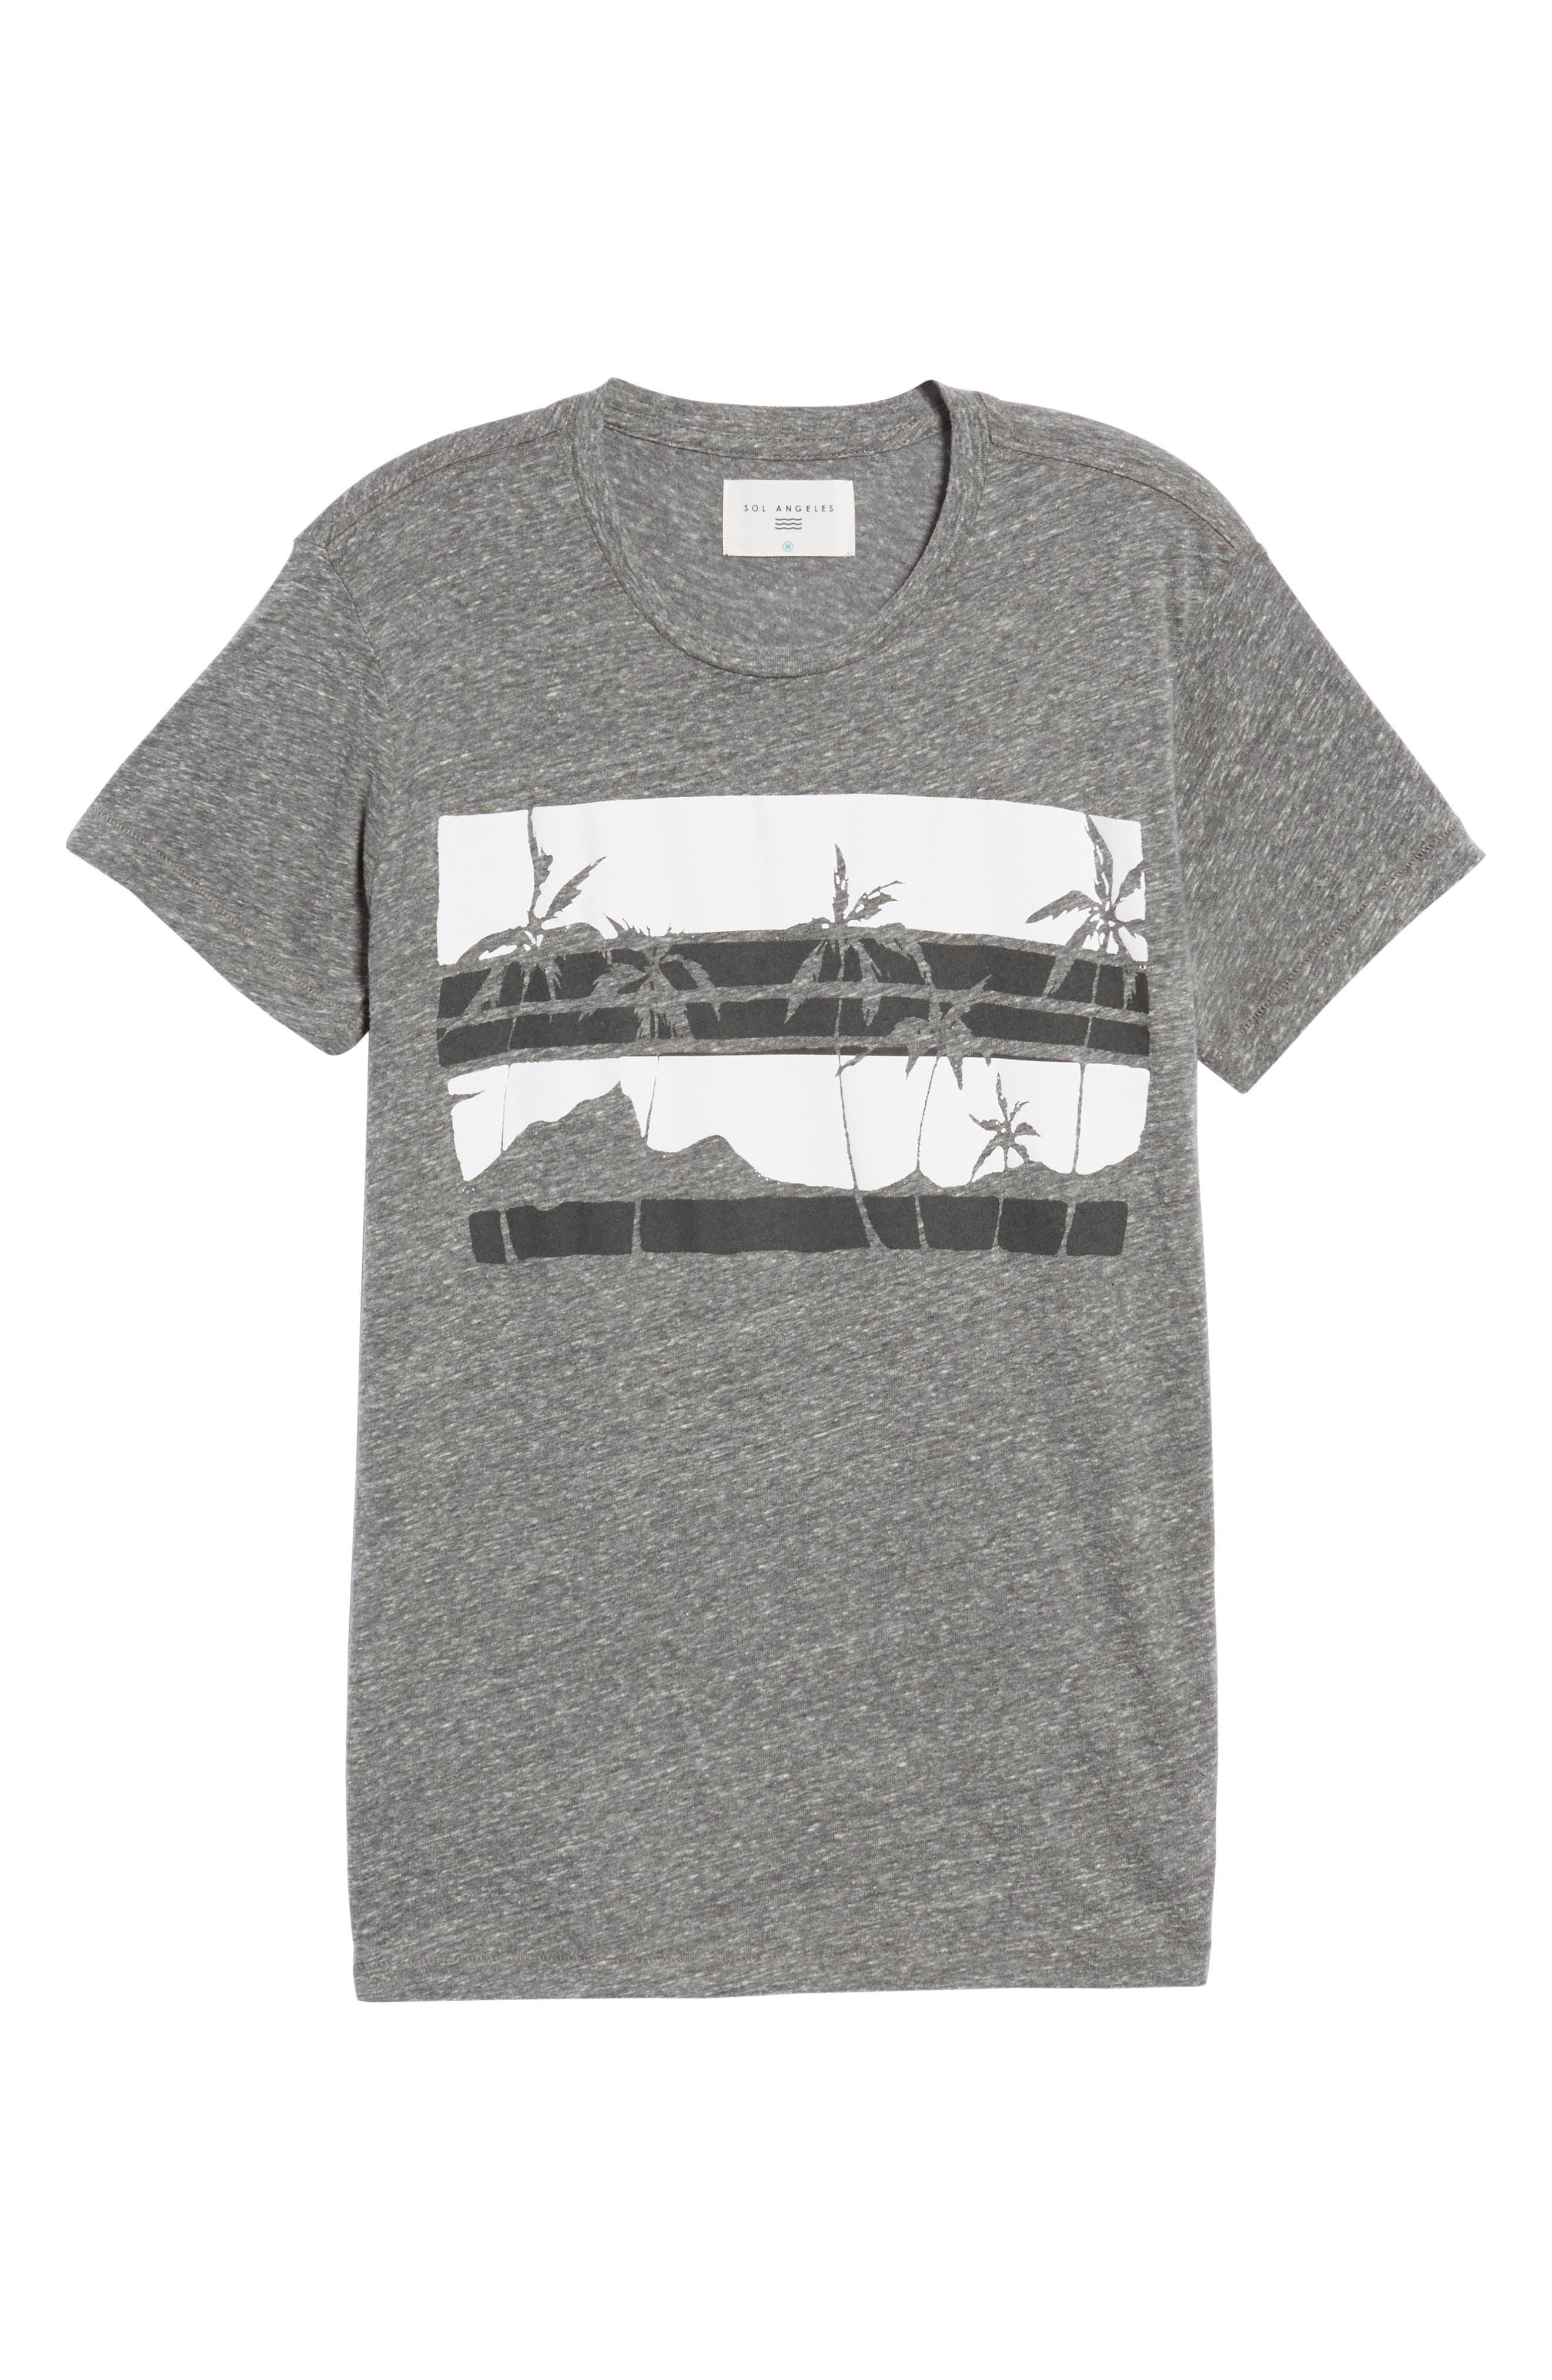 Las Palmas T-Shirt,                             Alternate thumbnail 6, color,                             060